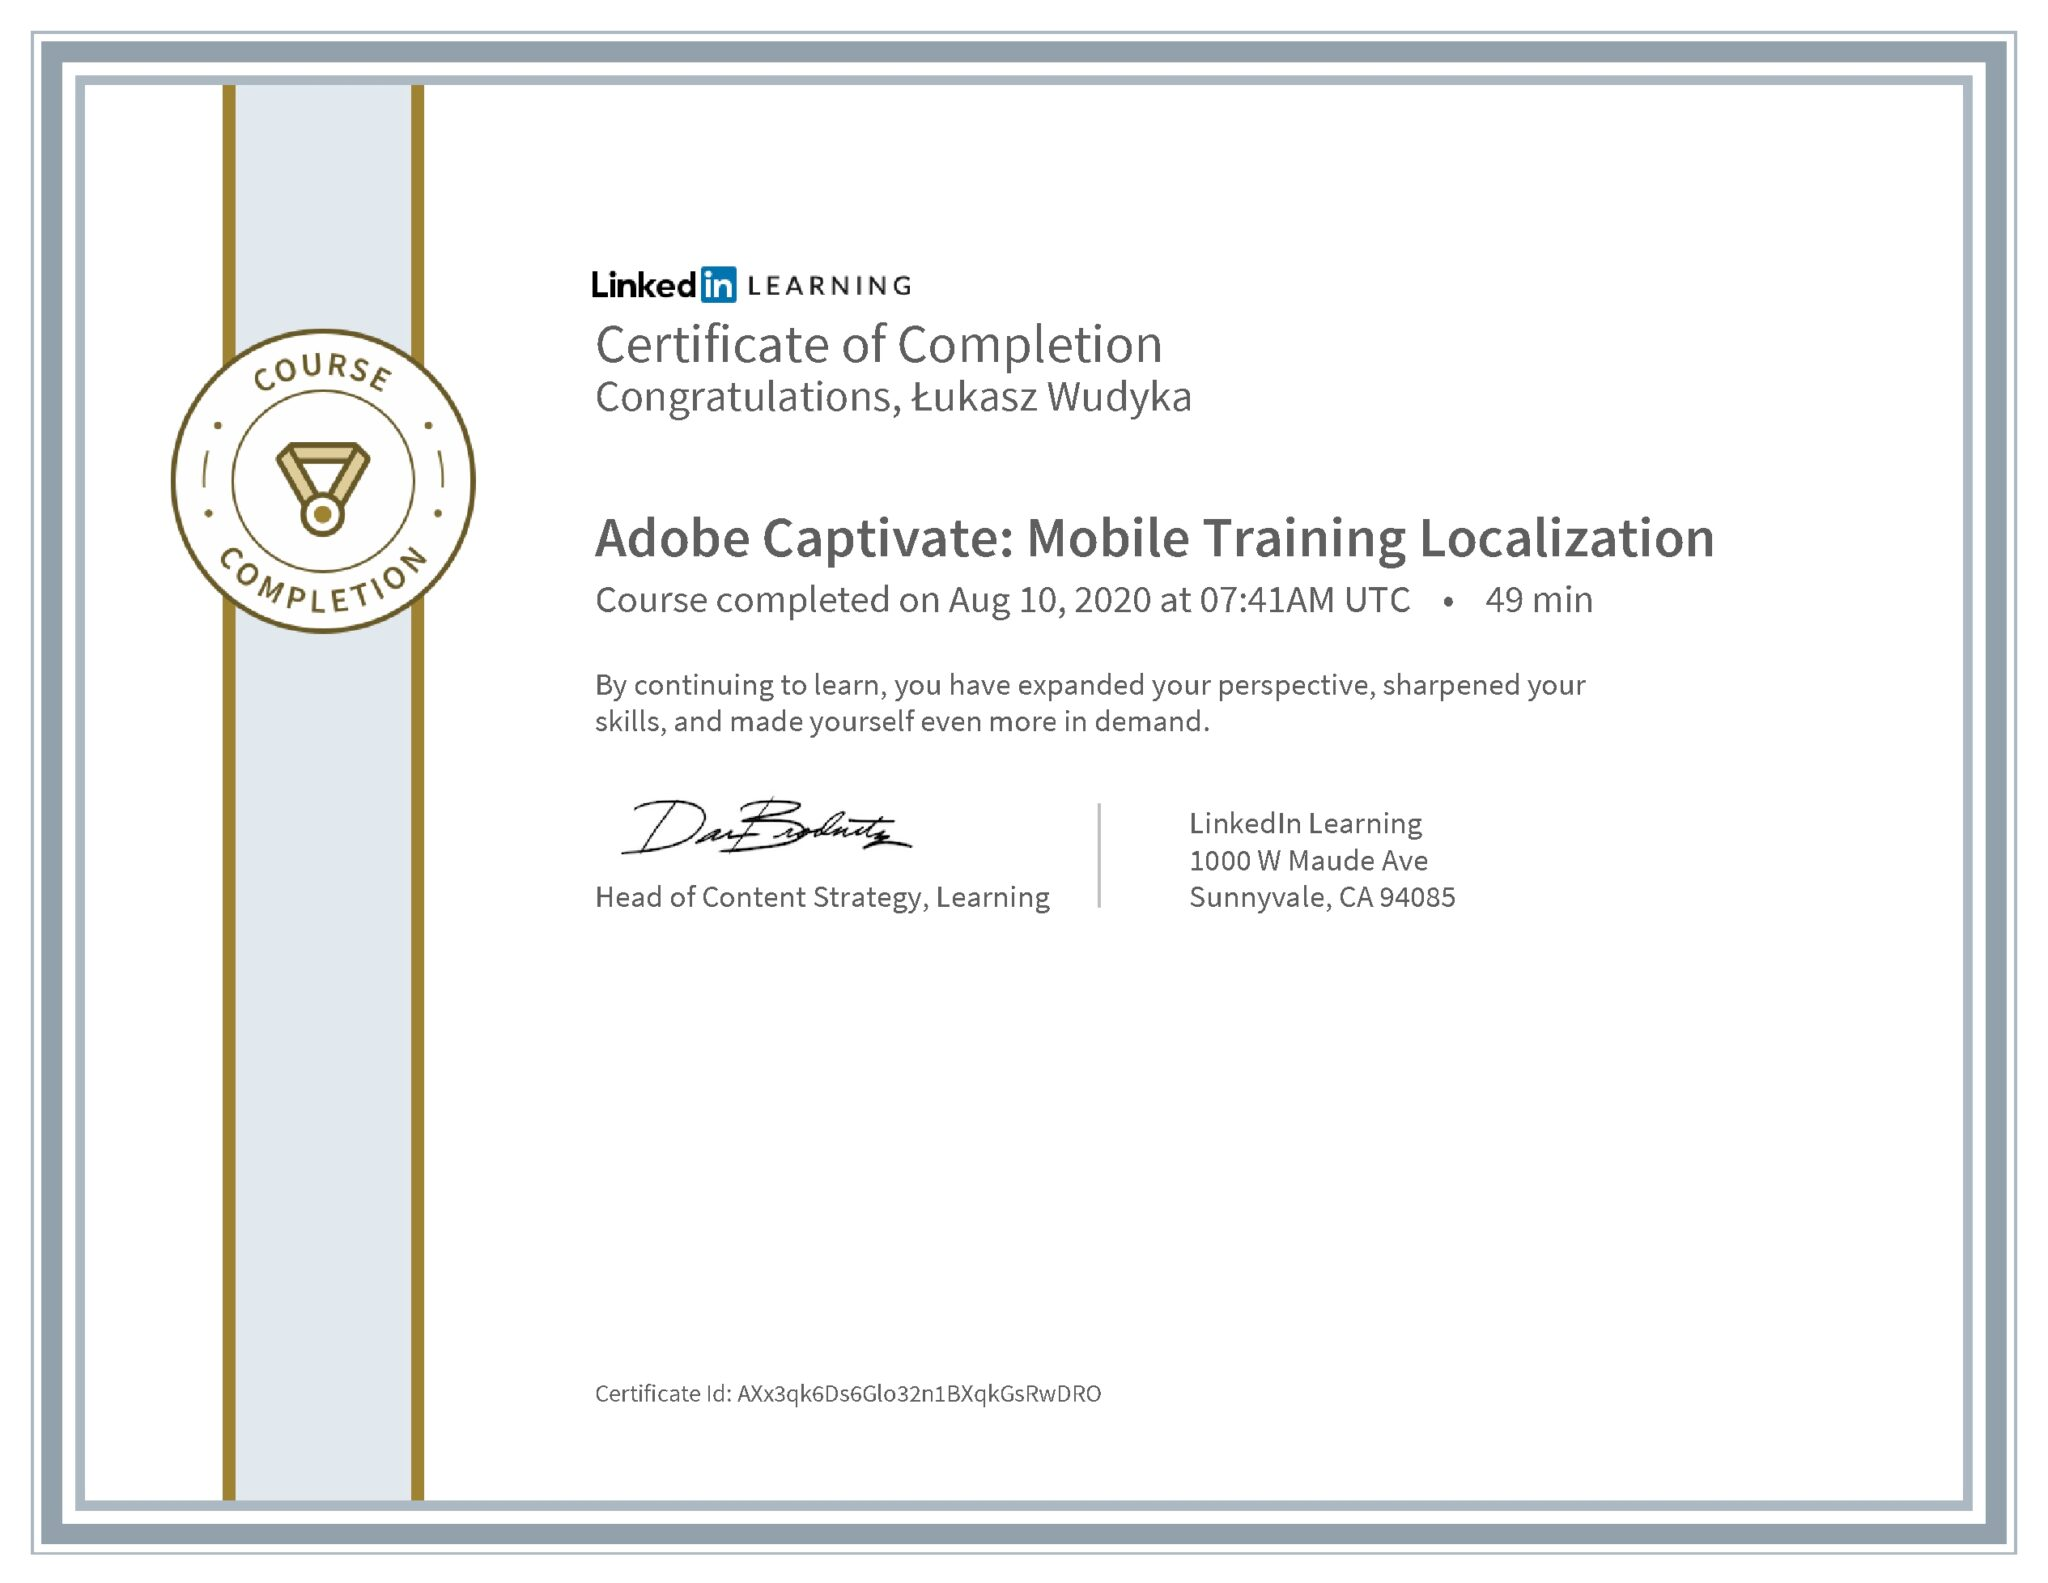 Łukasz Wudyka certyfikat LinkedIn Adobe Captivate: Mobile Training Localization